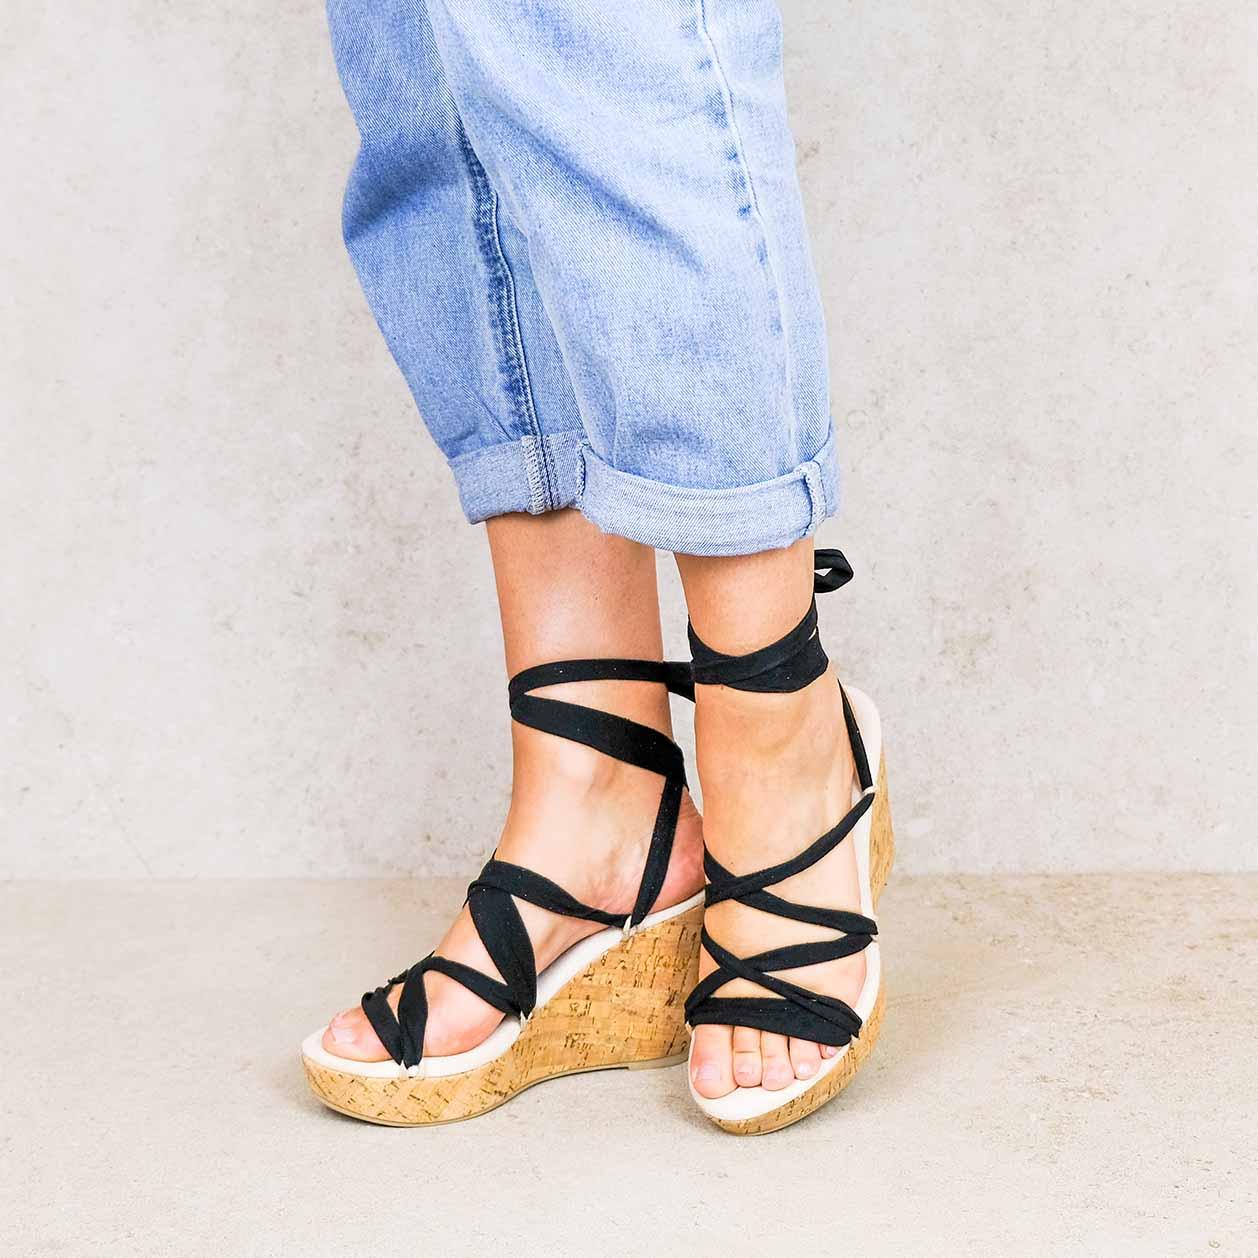 Chilon-cork-2_ lintsandalen sandals travelsandals vegan sustainable sandals wikkelsandalen